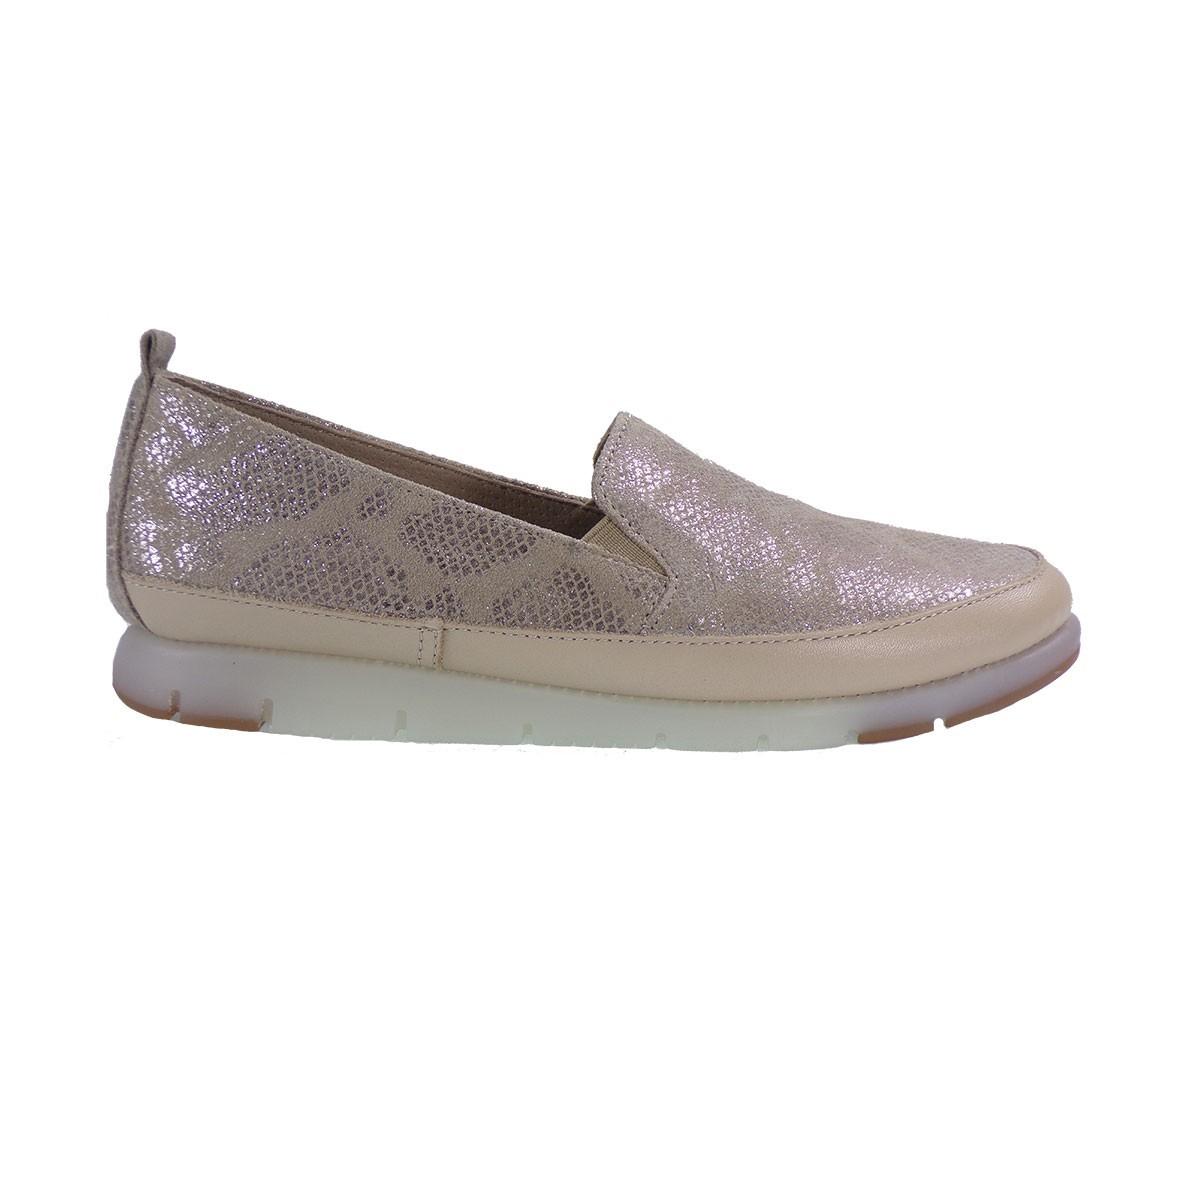 1fc4367e9ee Aerosoles Shoes Γυναικεία Παπούτσια FAST LANE 887282222 Μπεζ Δέρμα